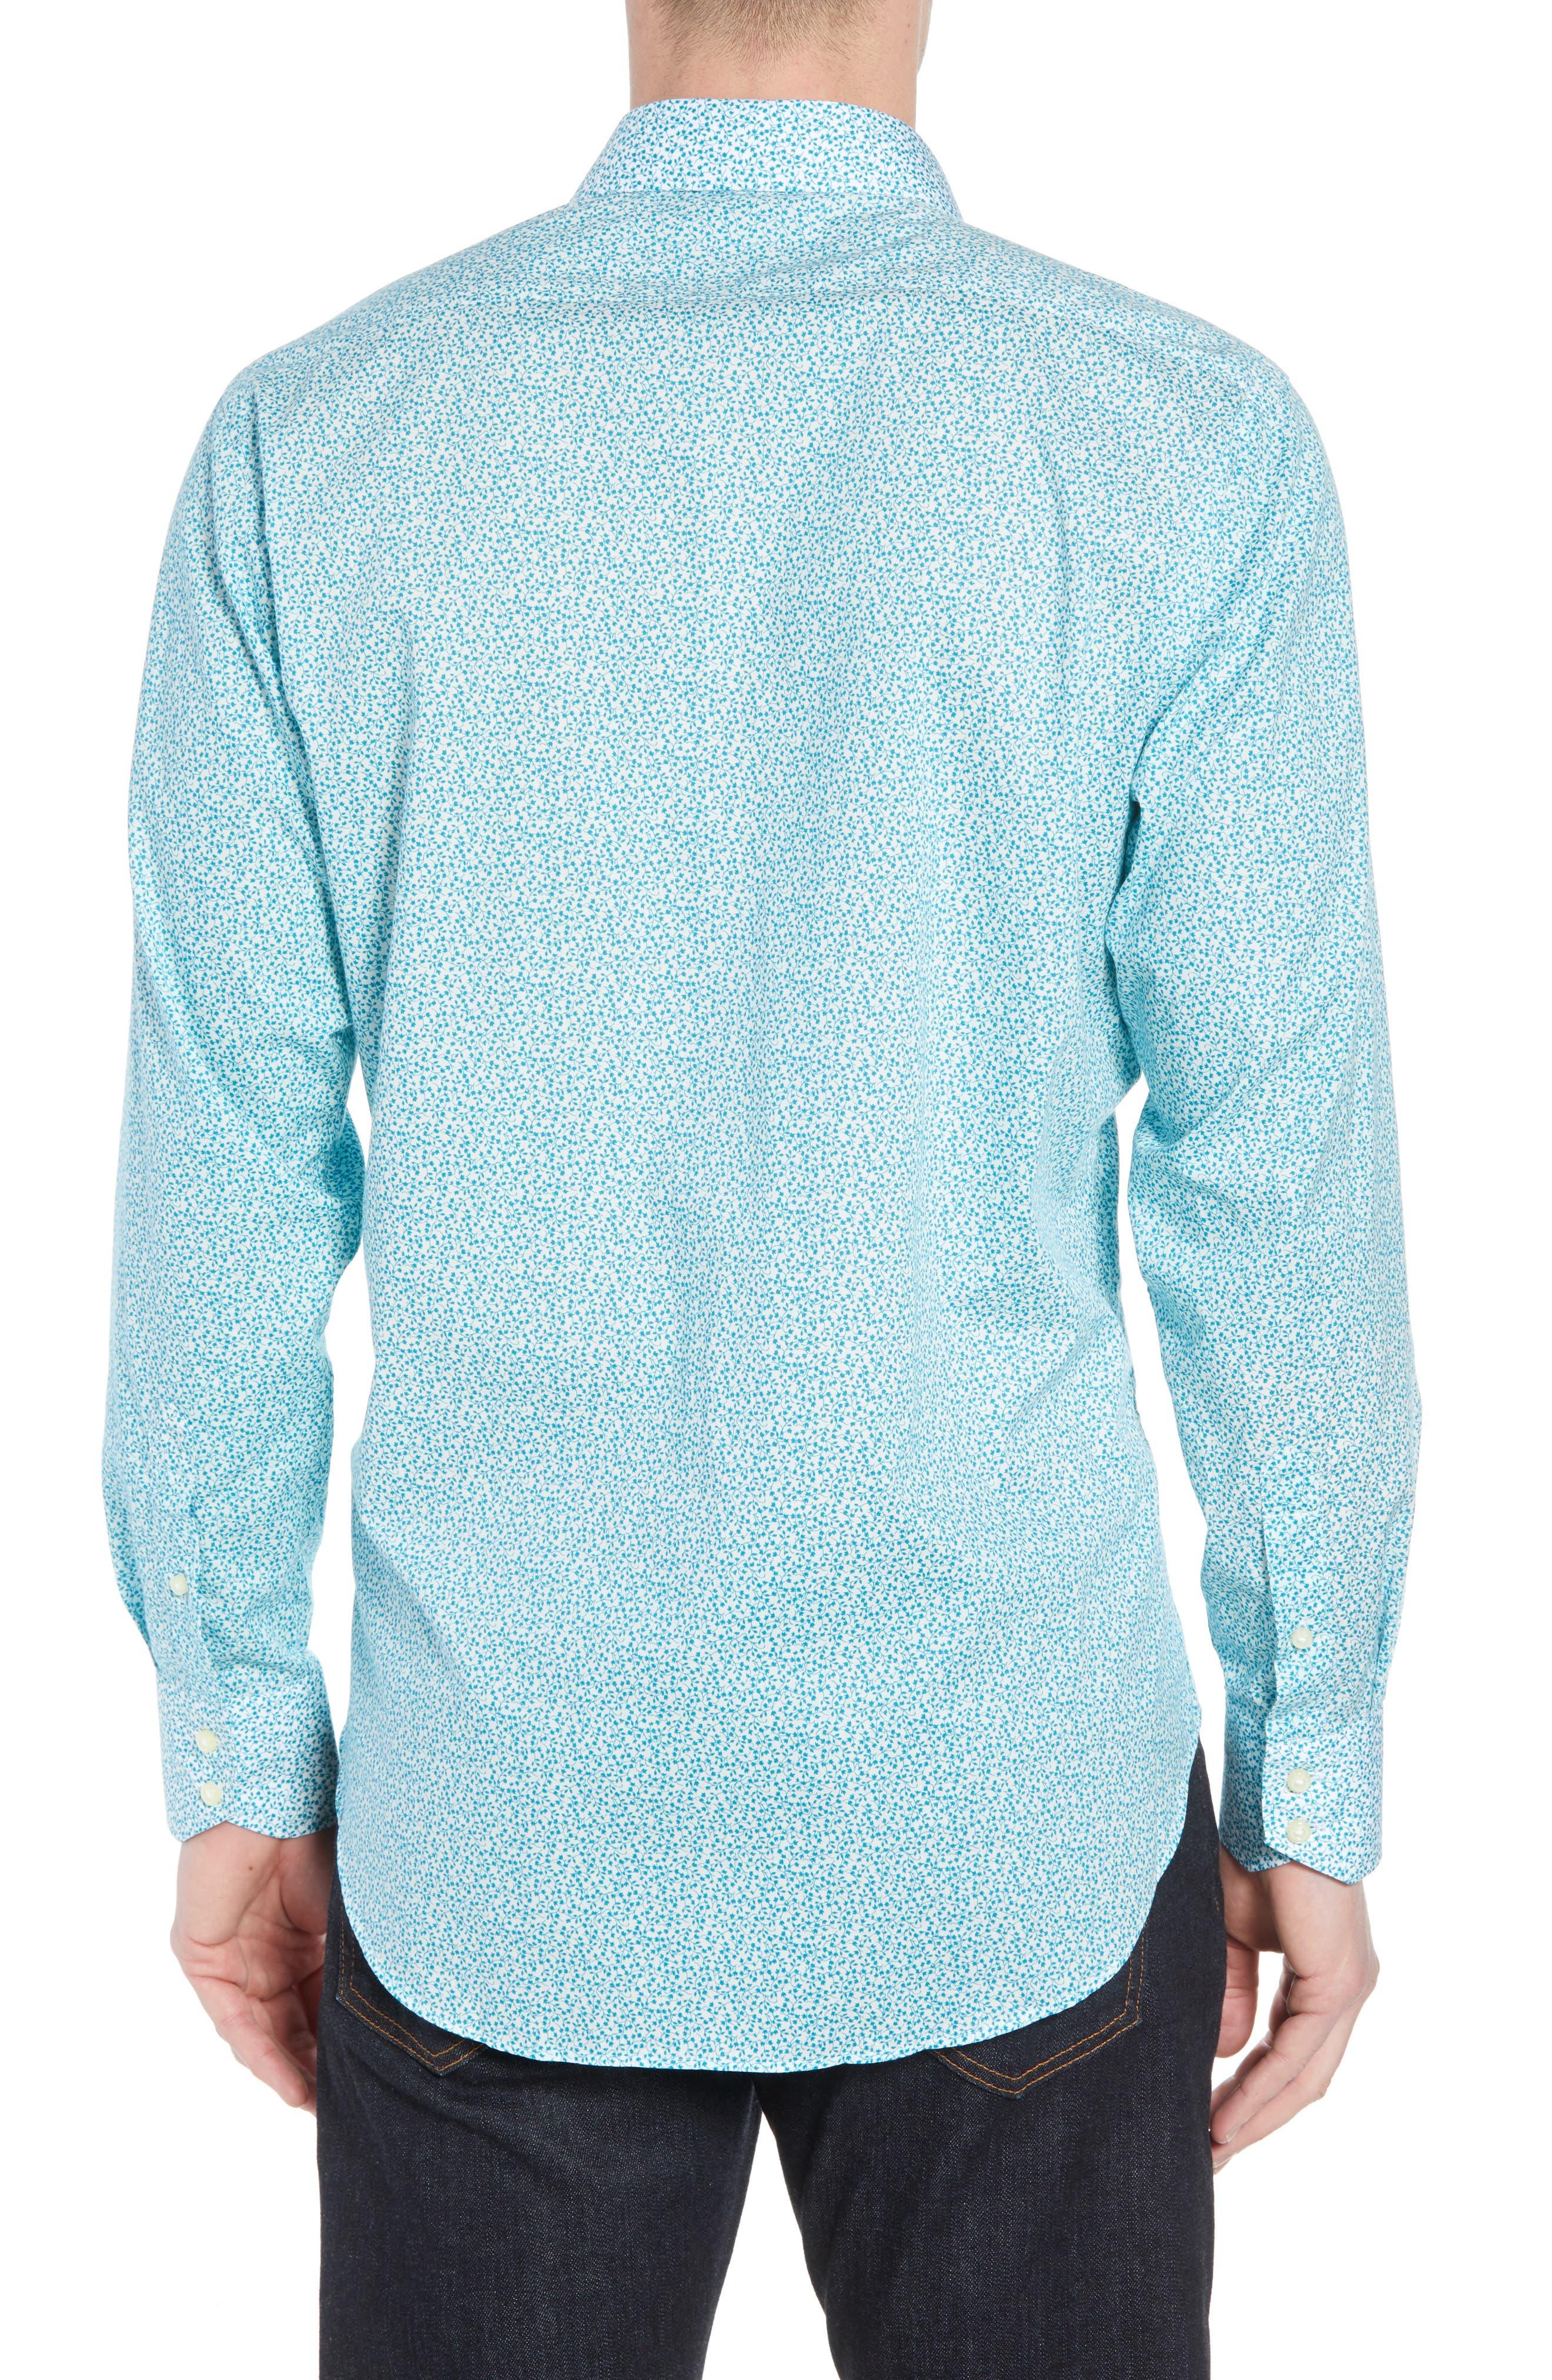 THOMAS DEAN,                             Regular Fit Floral Print Sport Shirt,                             Alternate thumbnail 2, color,                             300